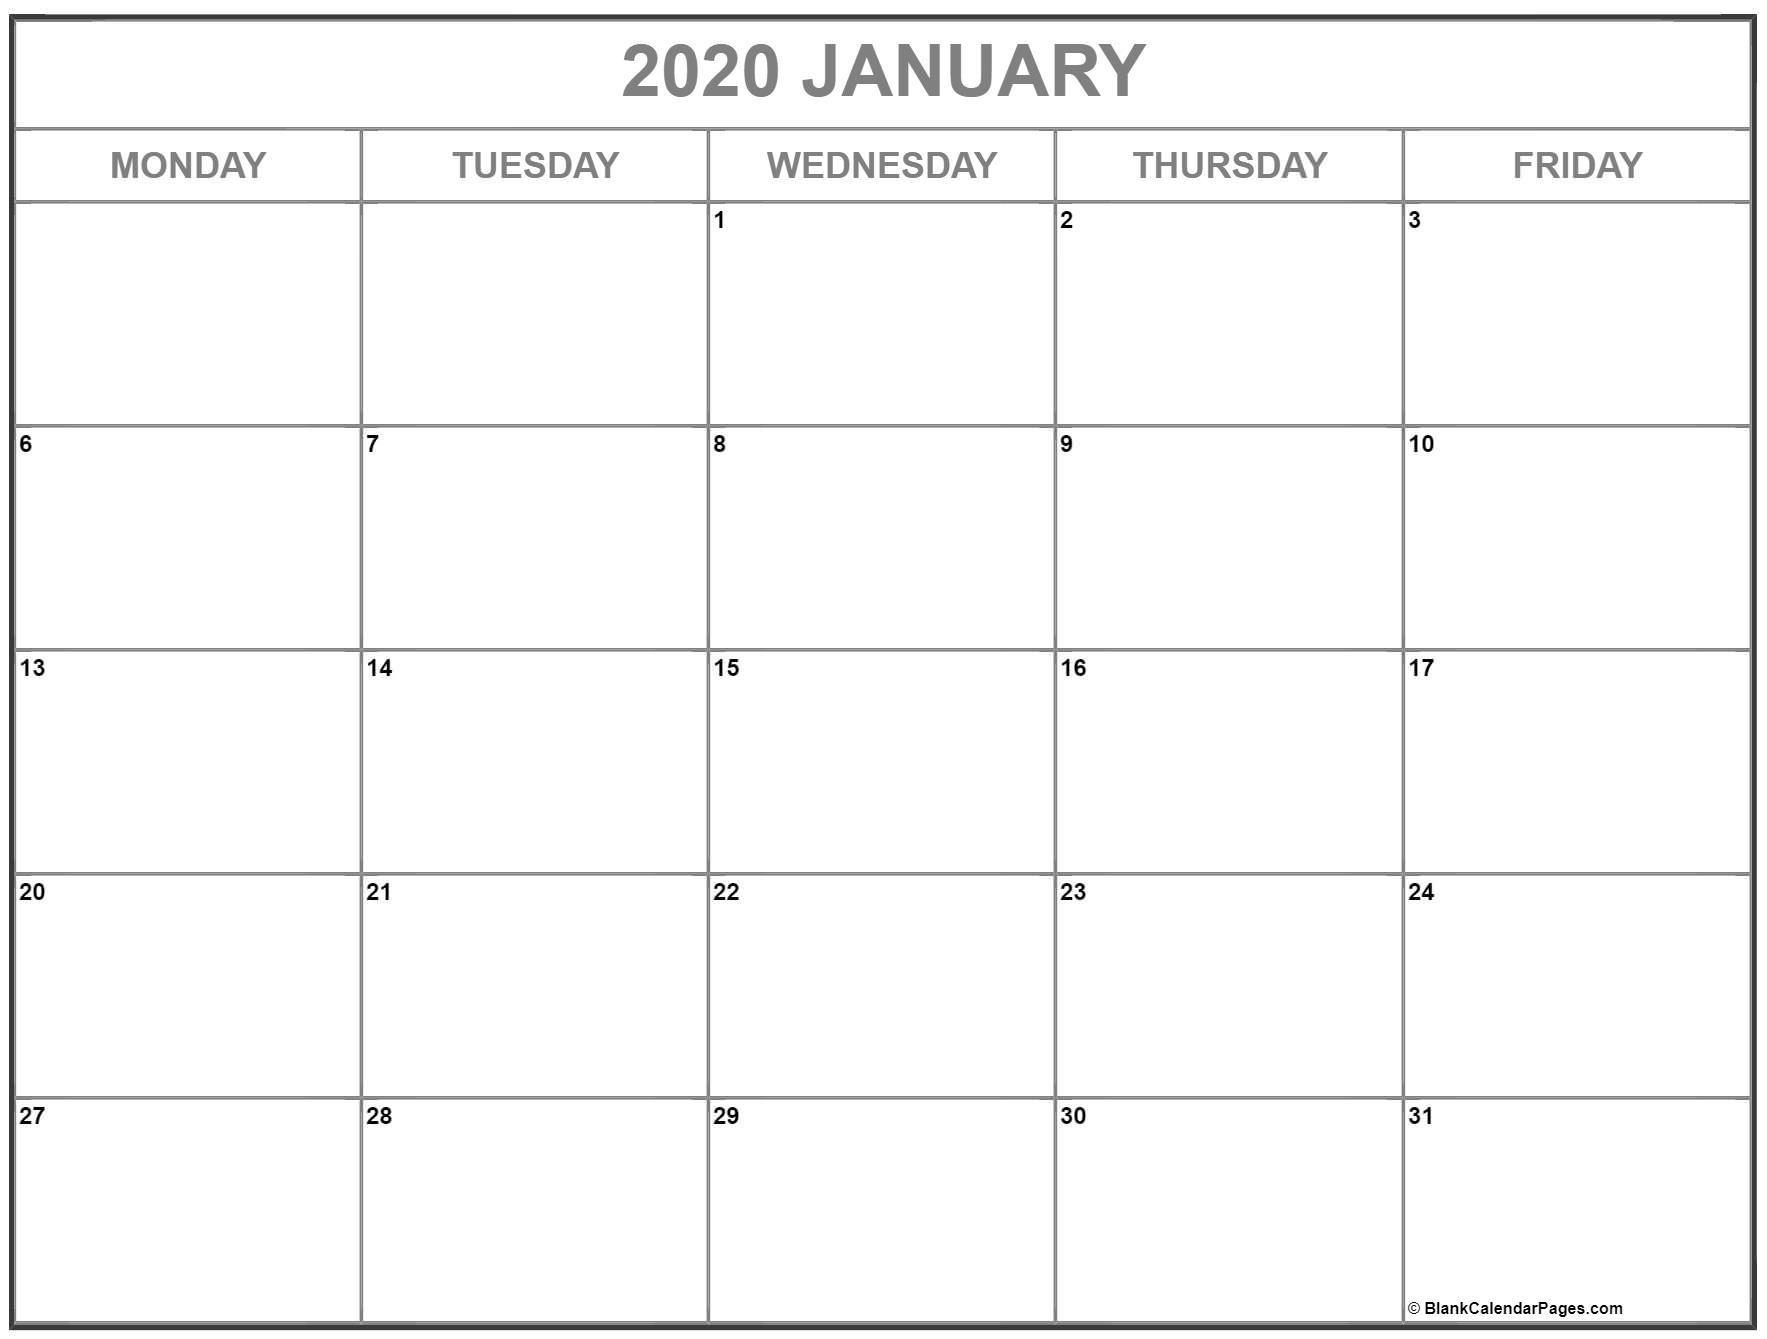 Best Monday Thru Friday Calendsr In 2020 | Calendar